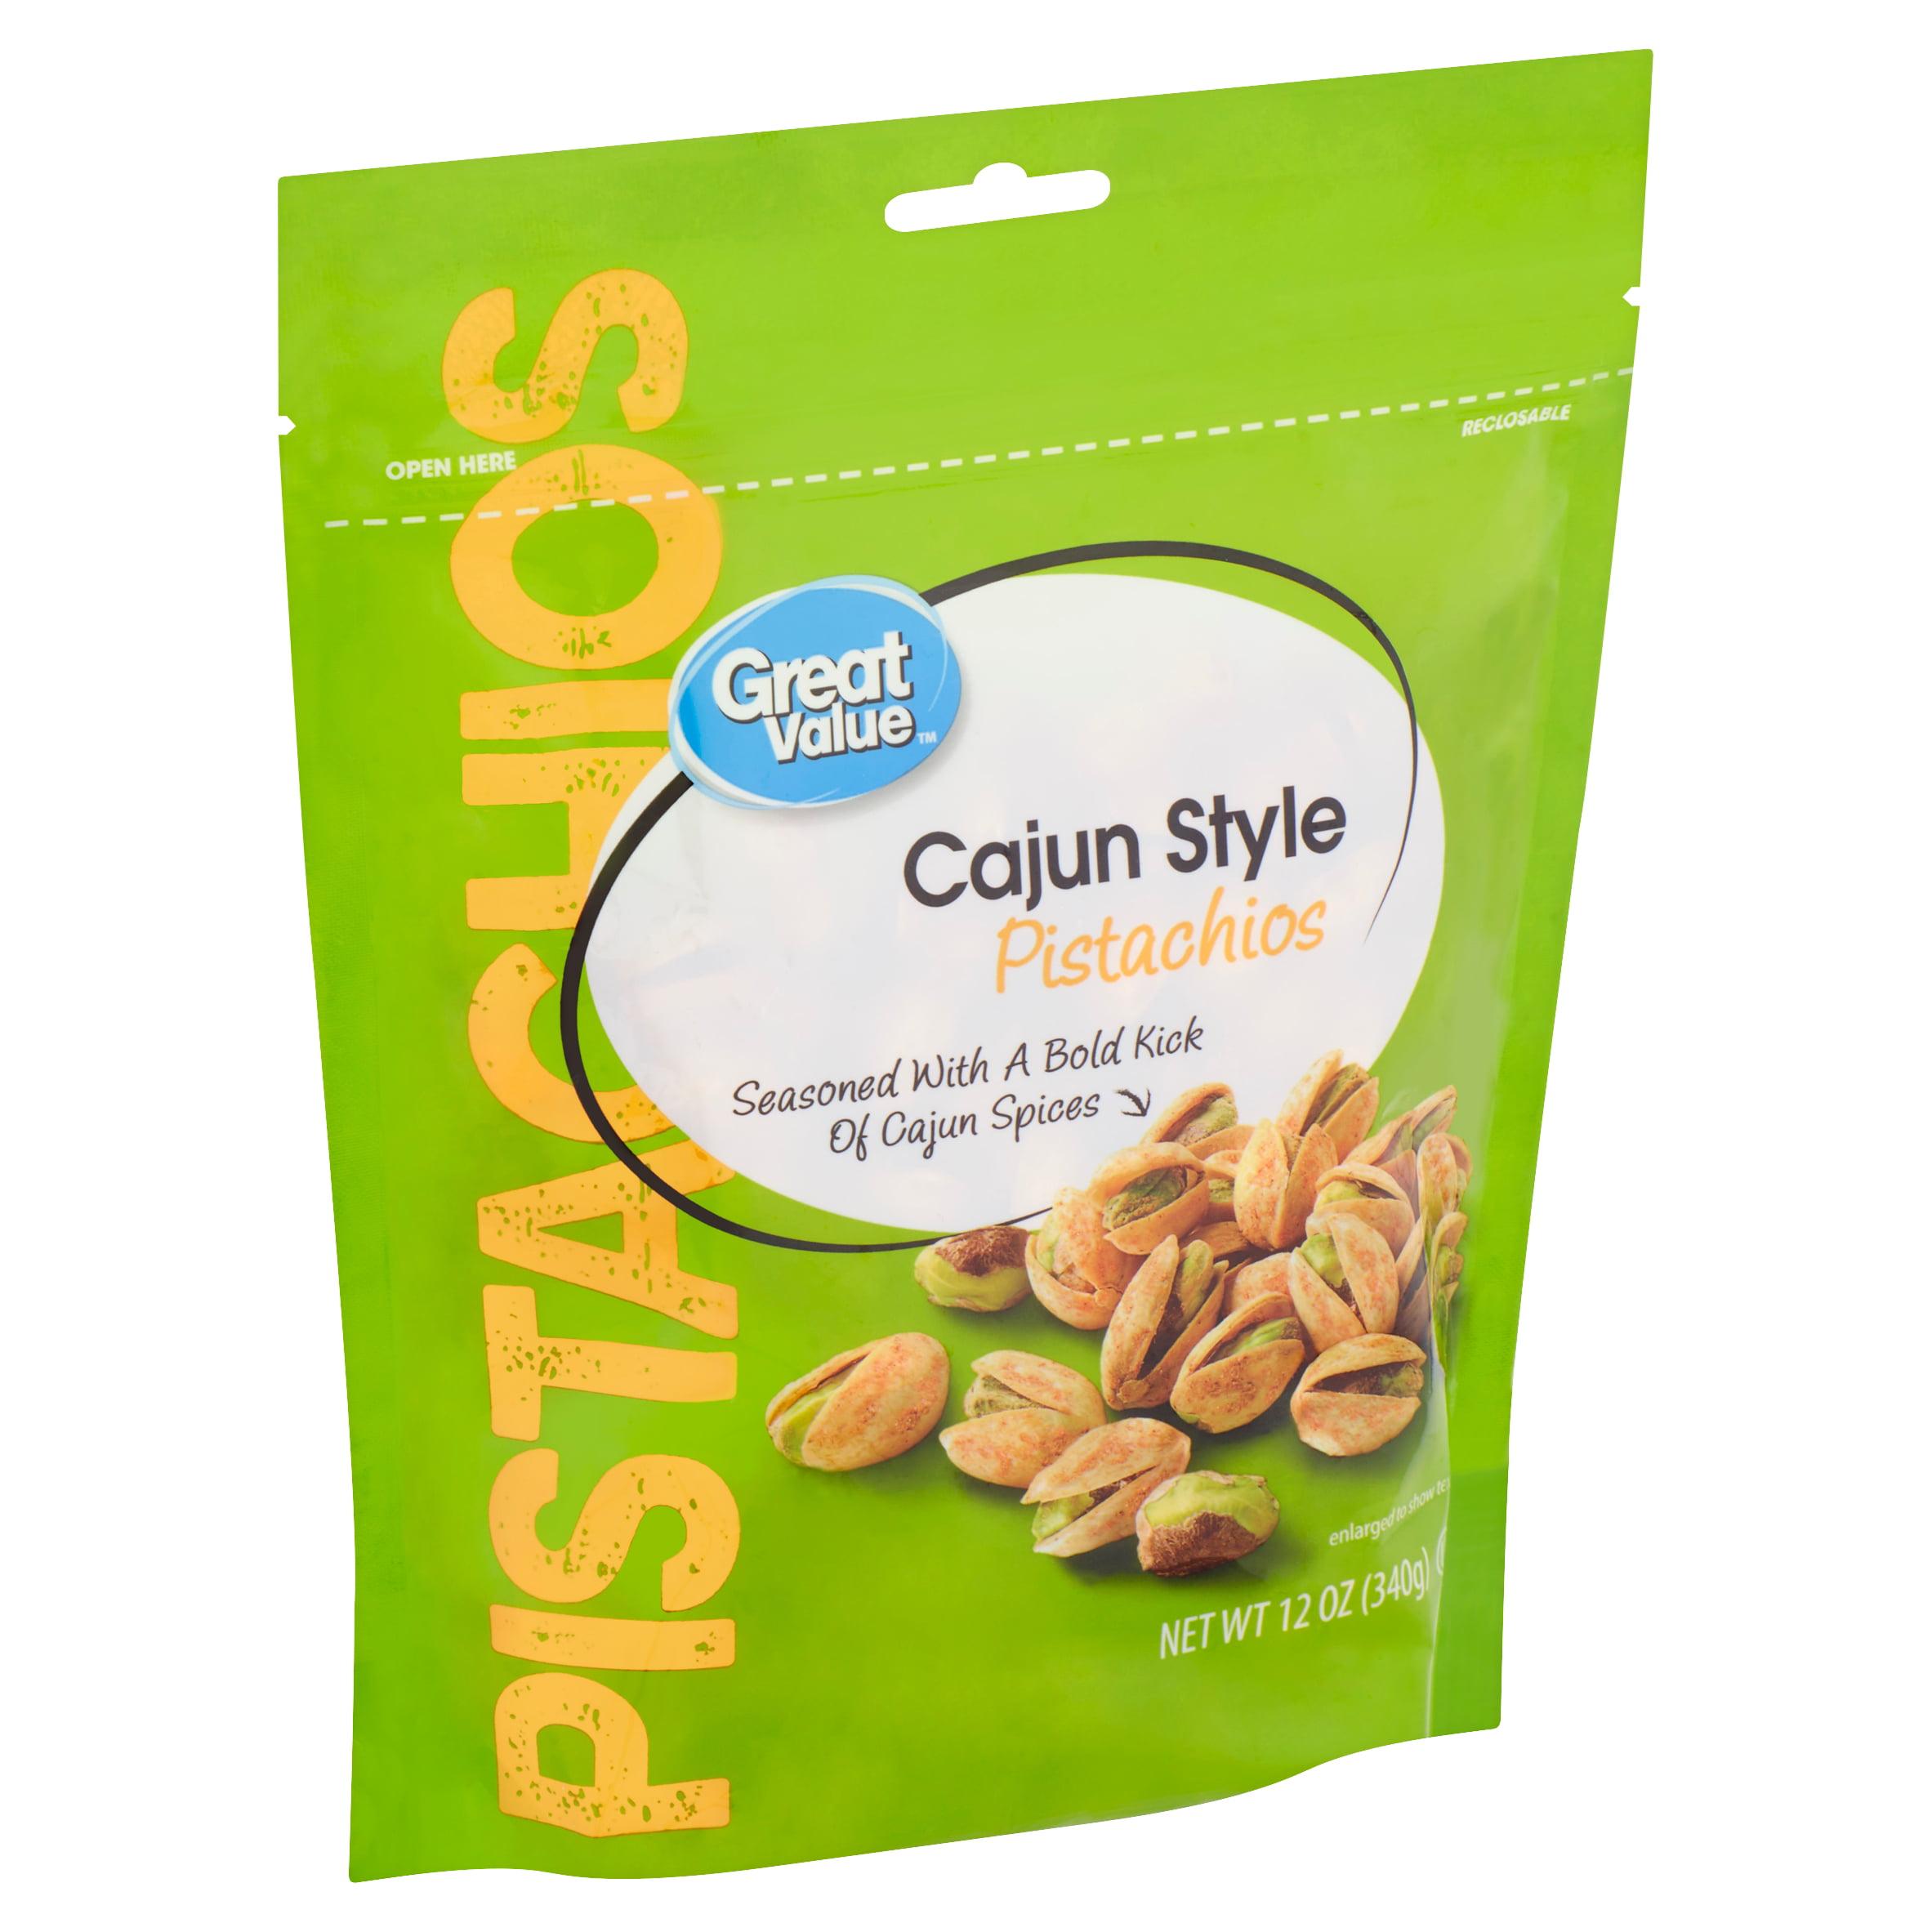 9c2802ef9be Great Value Cajun Style Pistachios